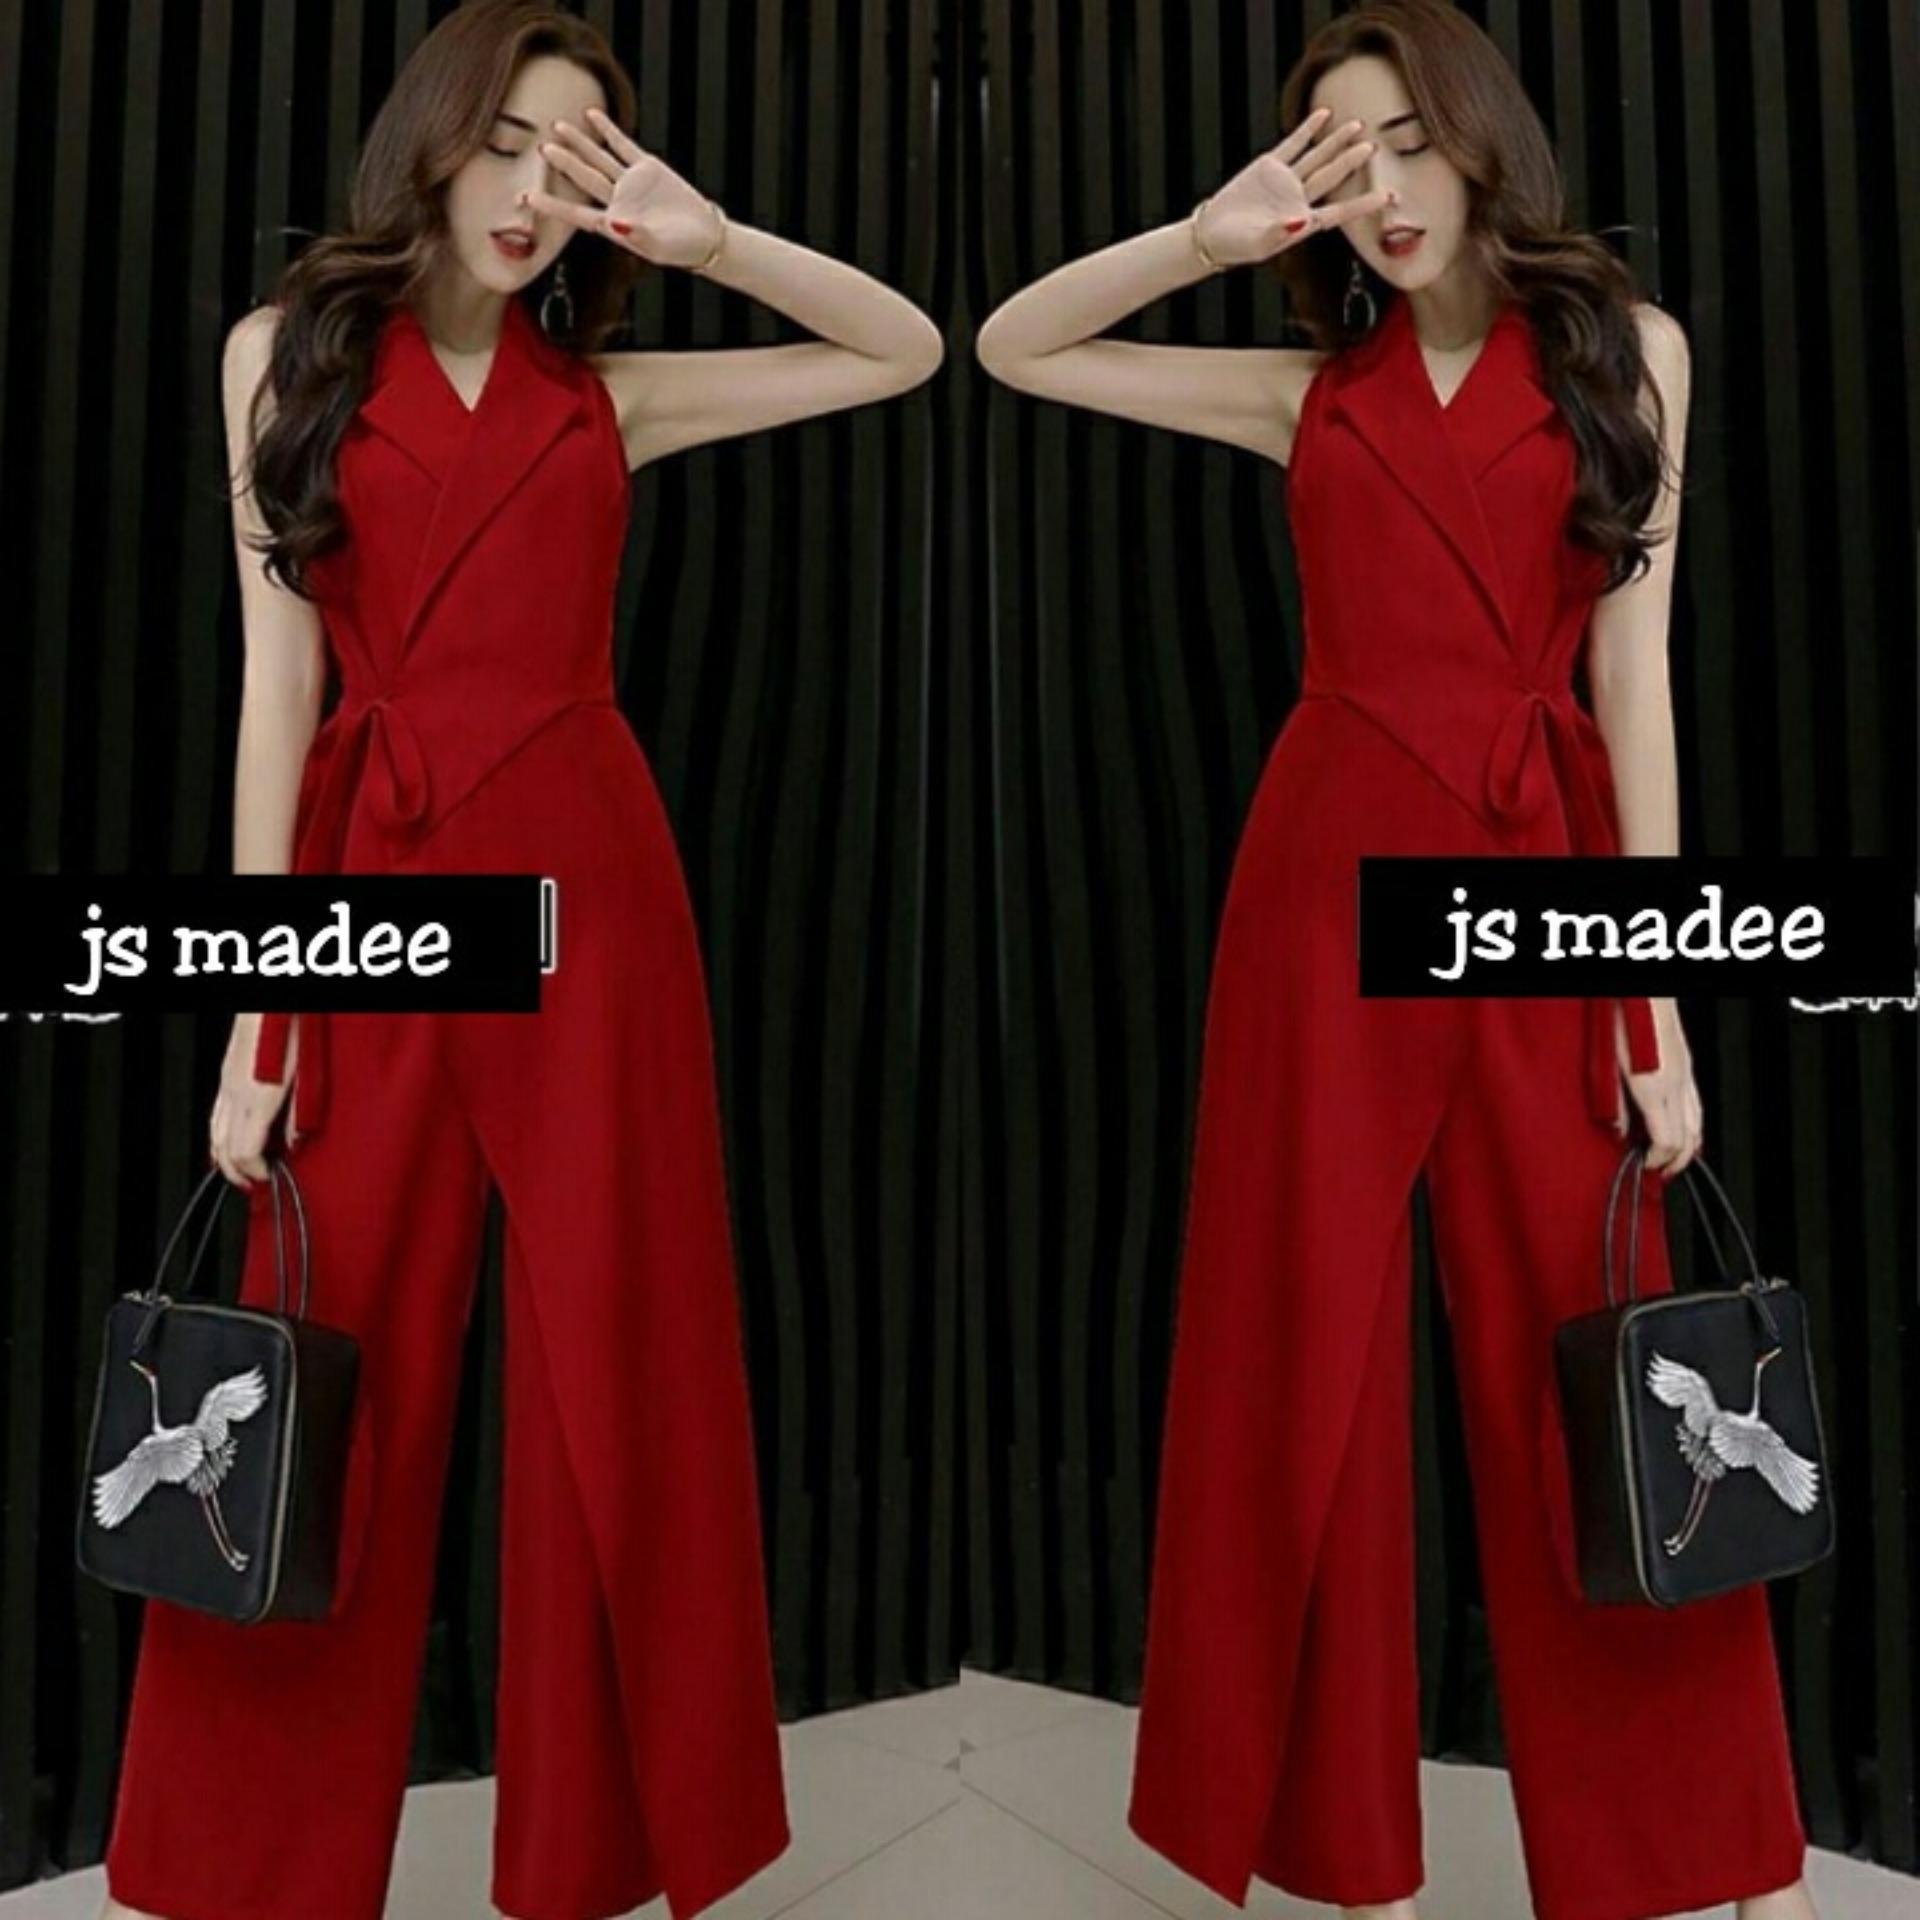 Tof Terbaru Murah Baju Murah Wanita Fashion Hijab Cape Jumpsuit ... b80e254b38